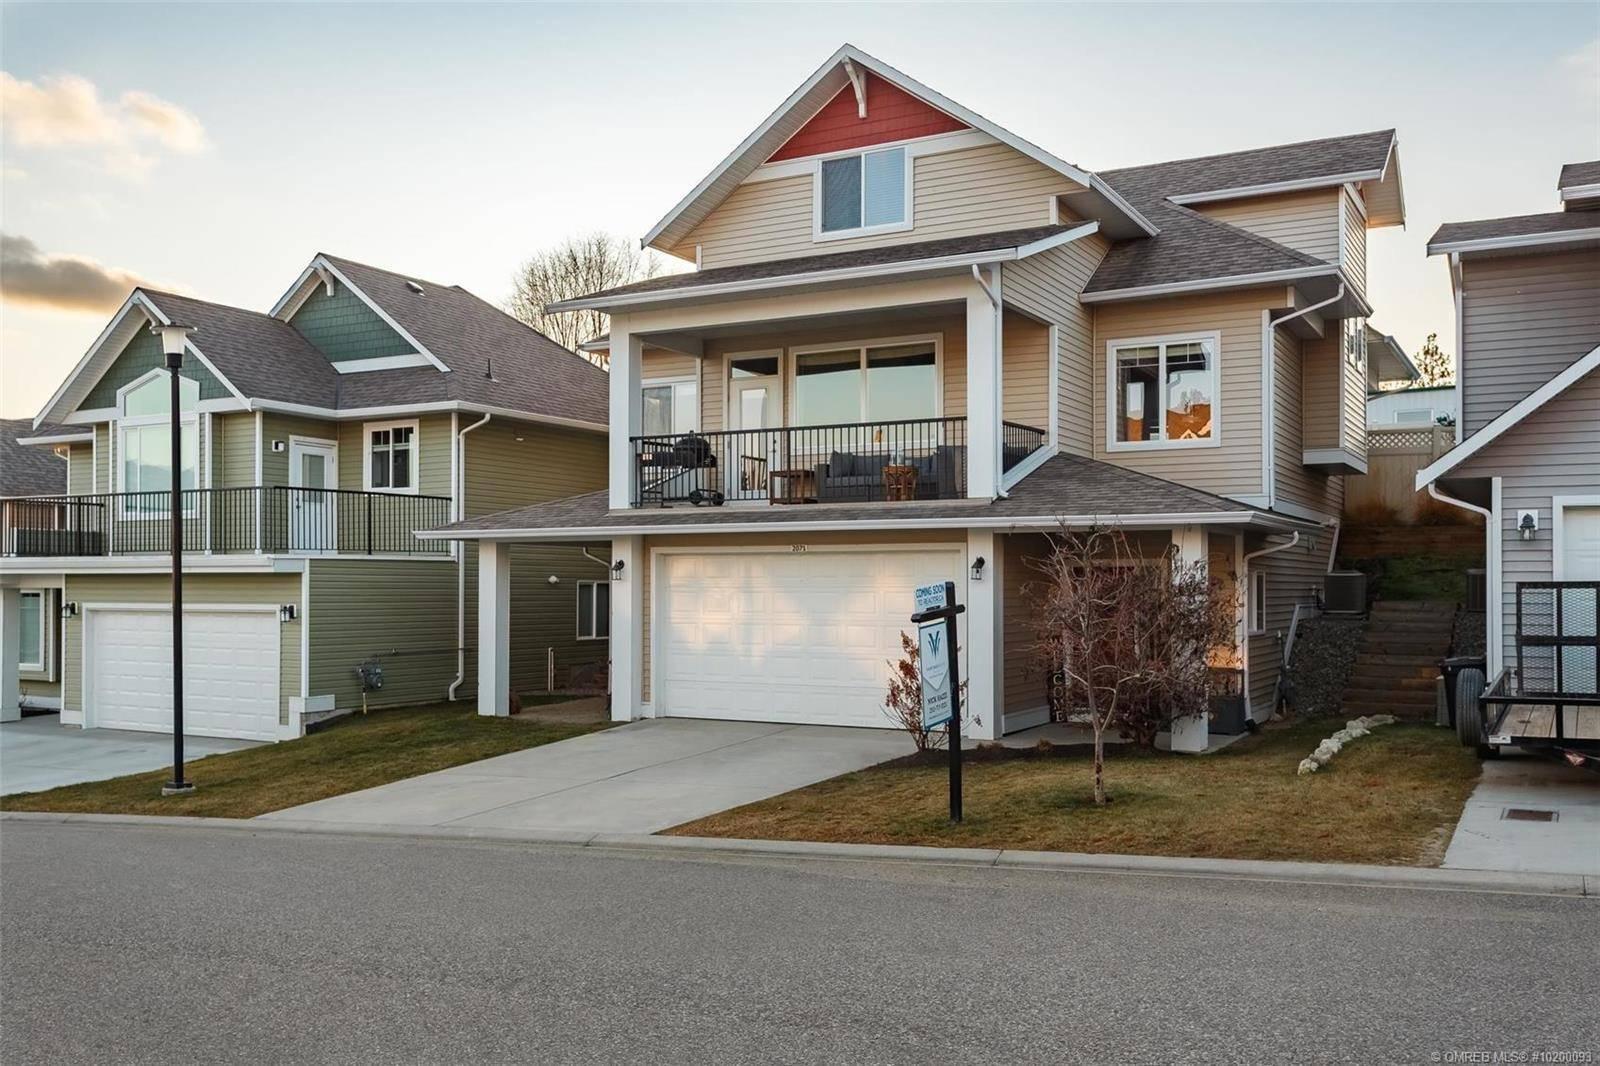 House for sale at 2071 Elkridge Dr West Kelowna British Columbia - MLS: 10200093